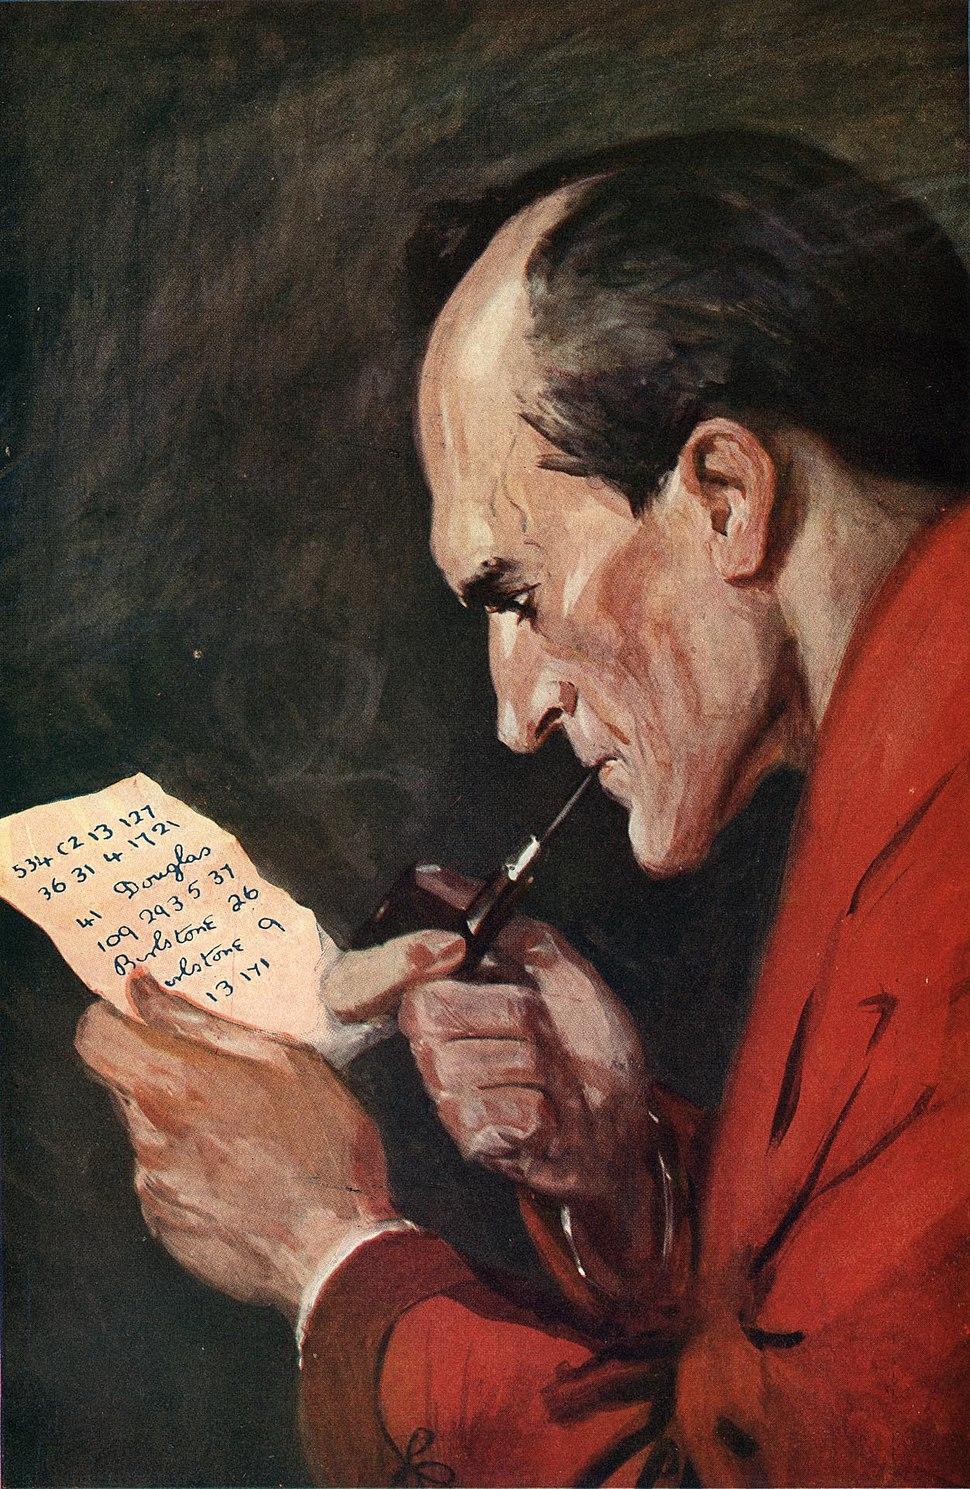 Adventures with Sherlock Holmes TD Gallery Jan 5-Mar 10, 2012